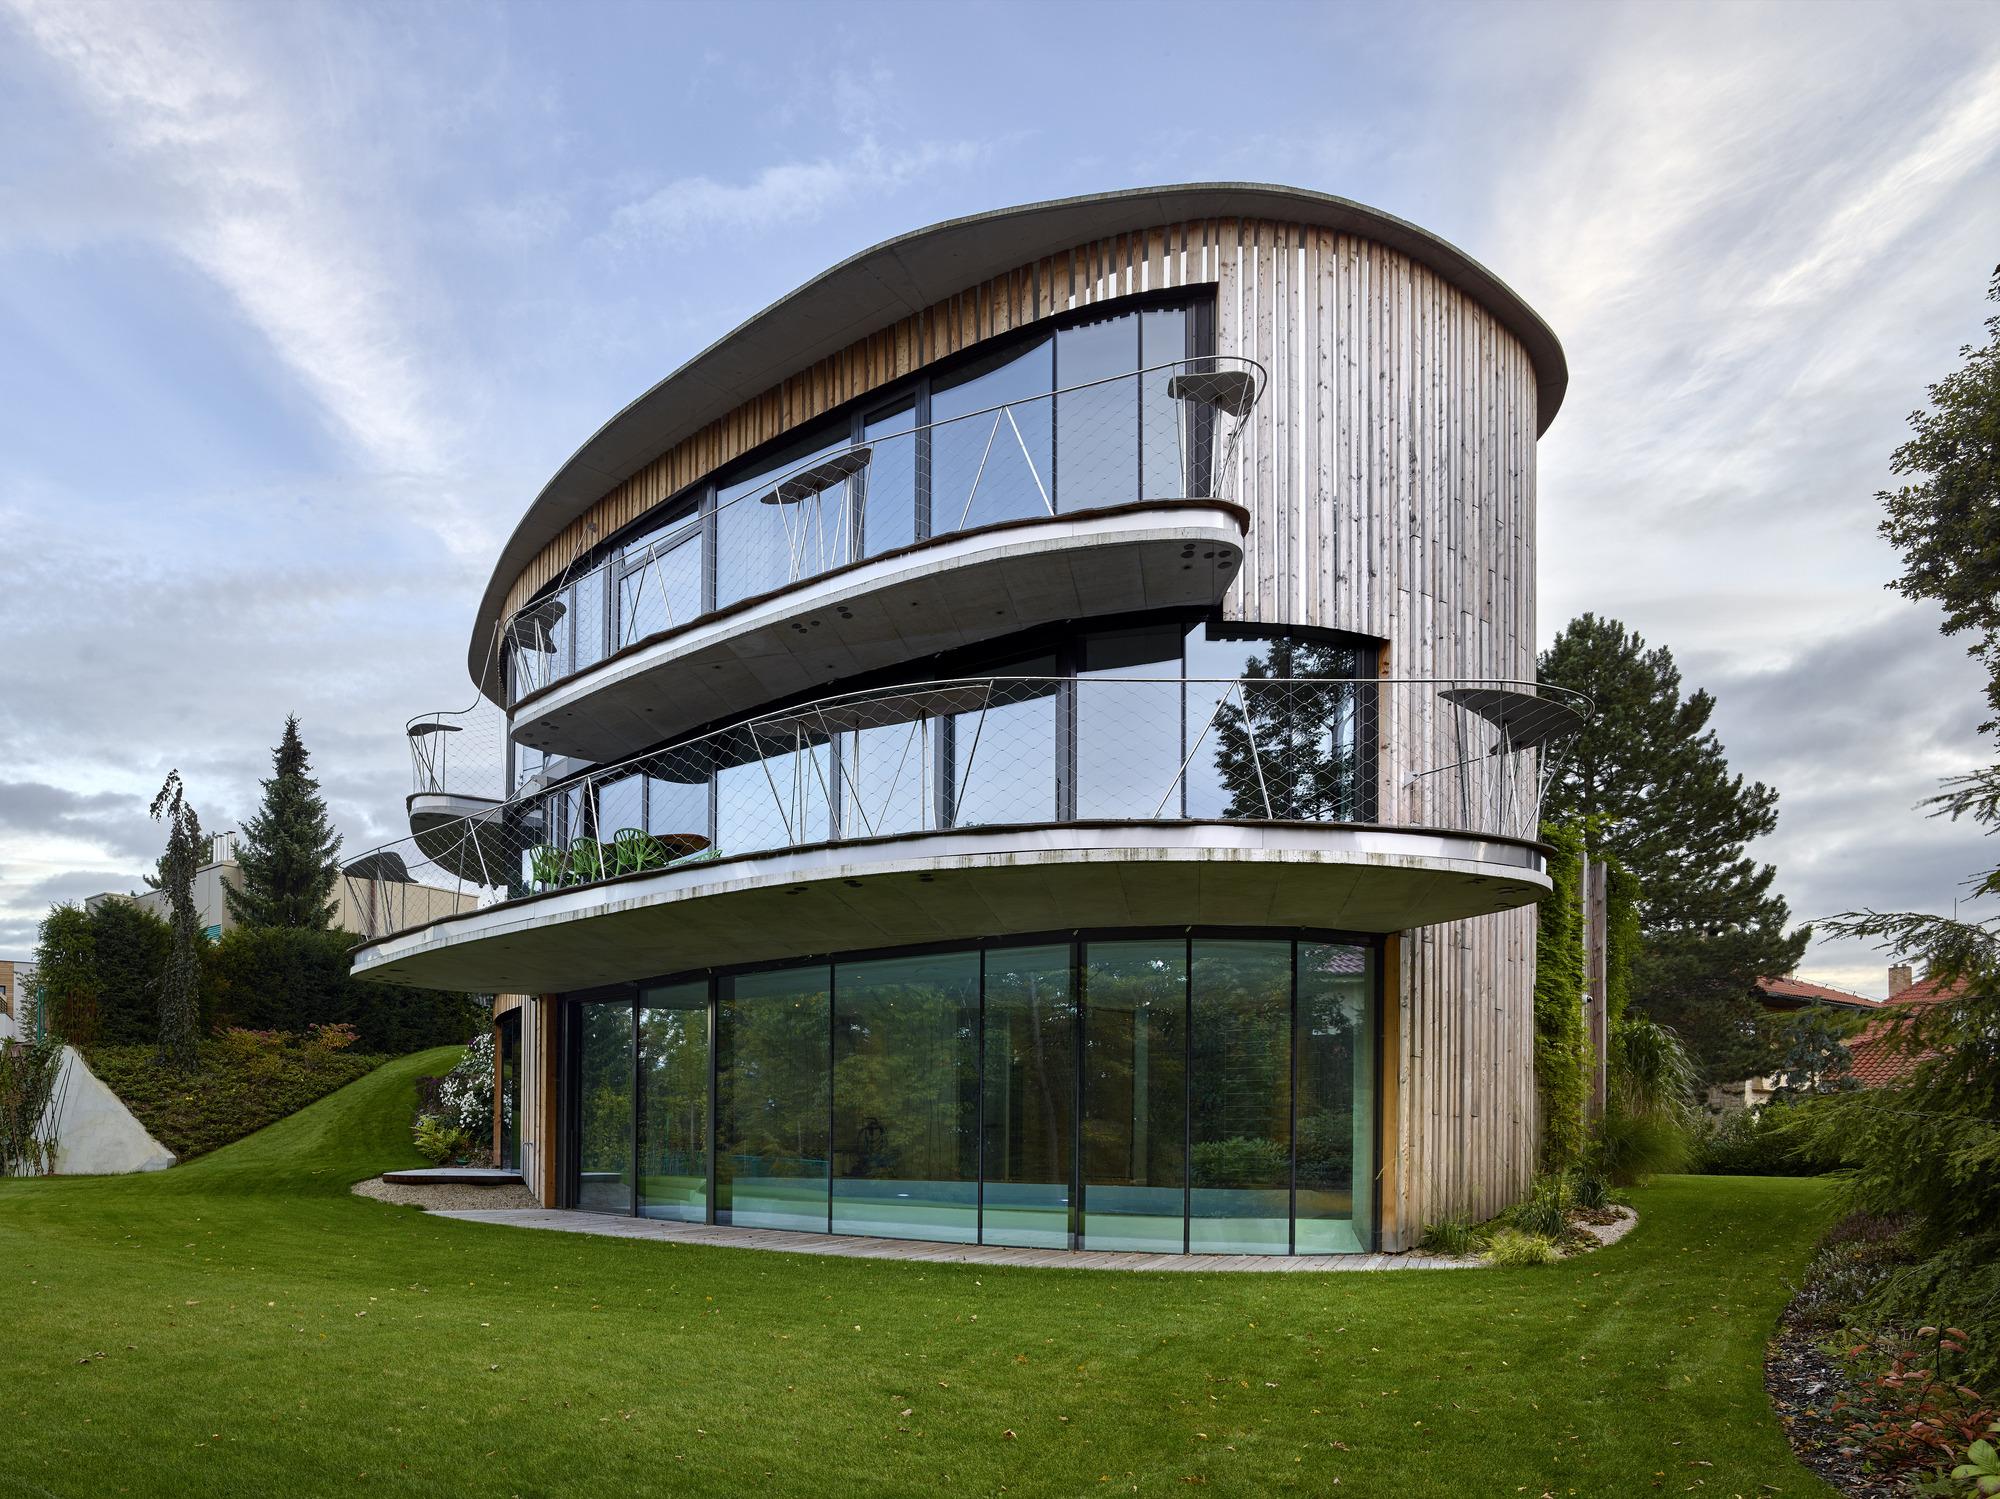 House by the Woods / Stanislav Fiala